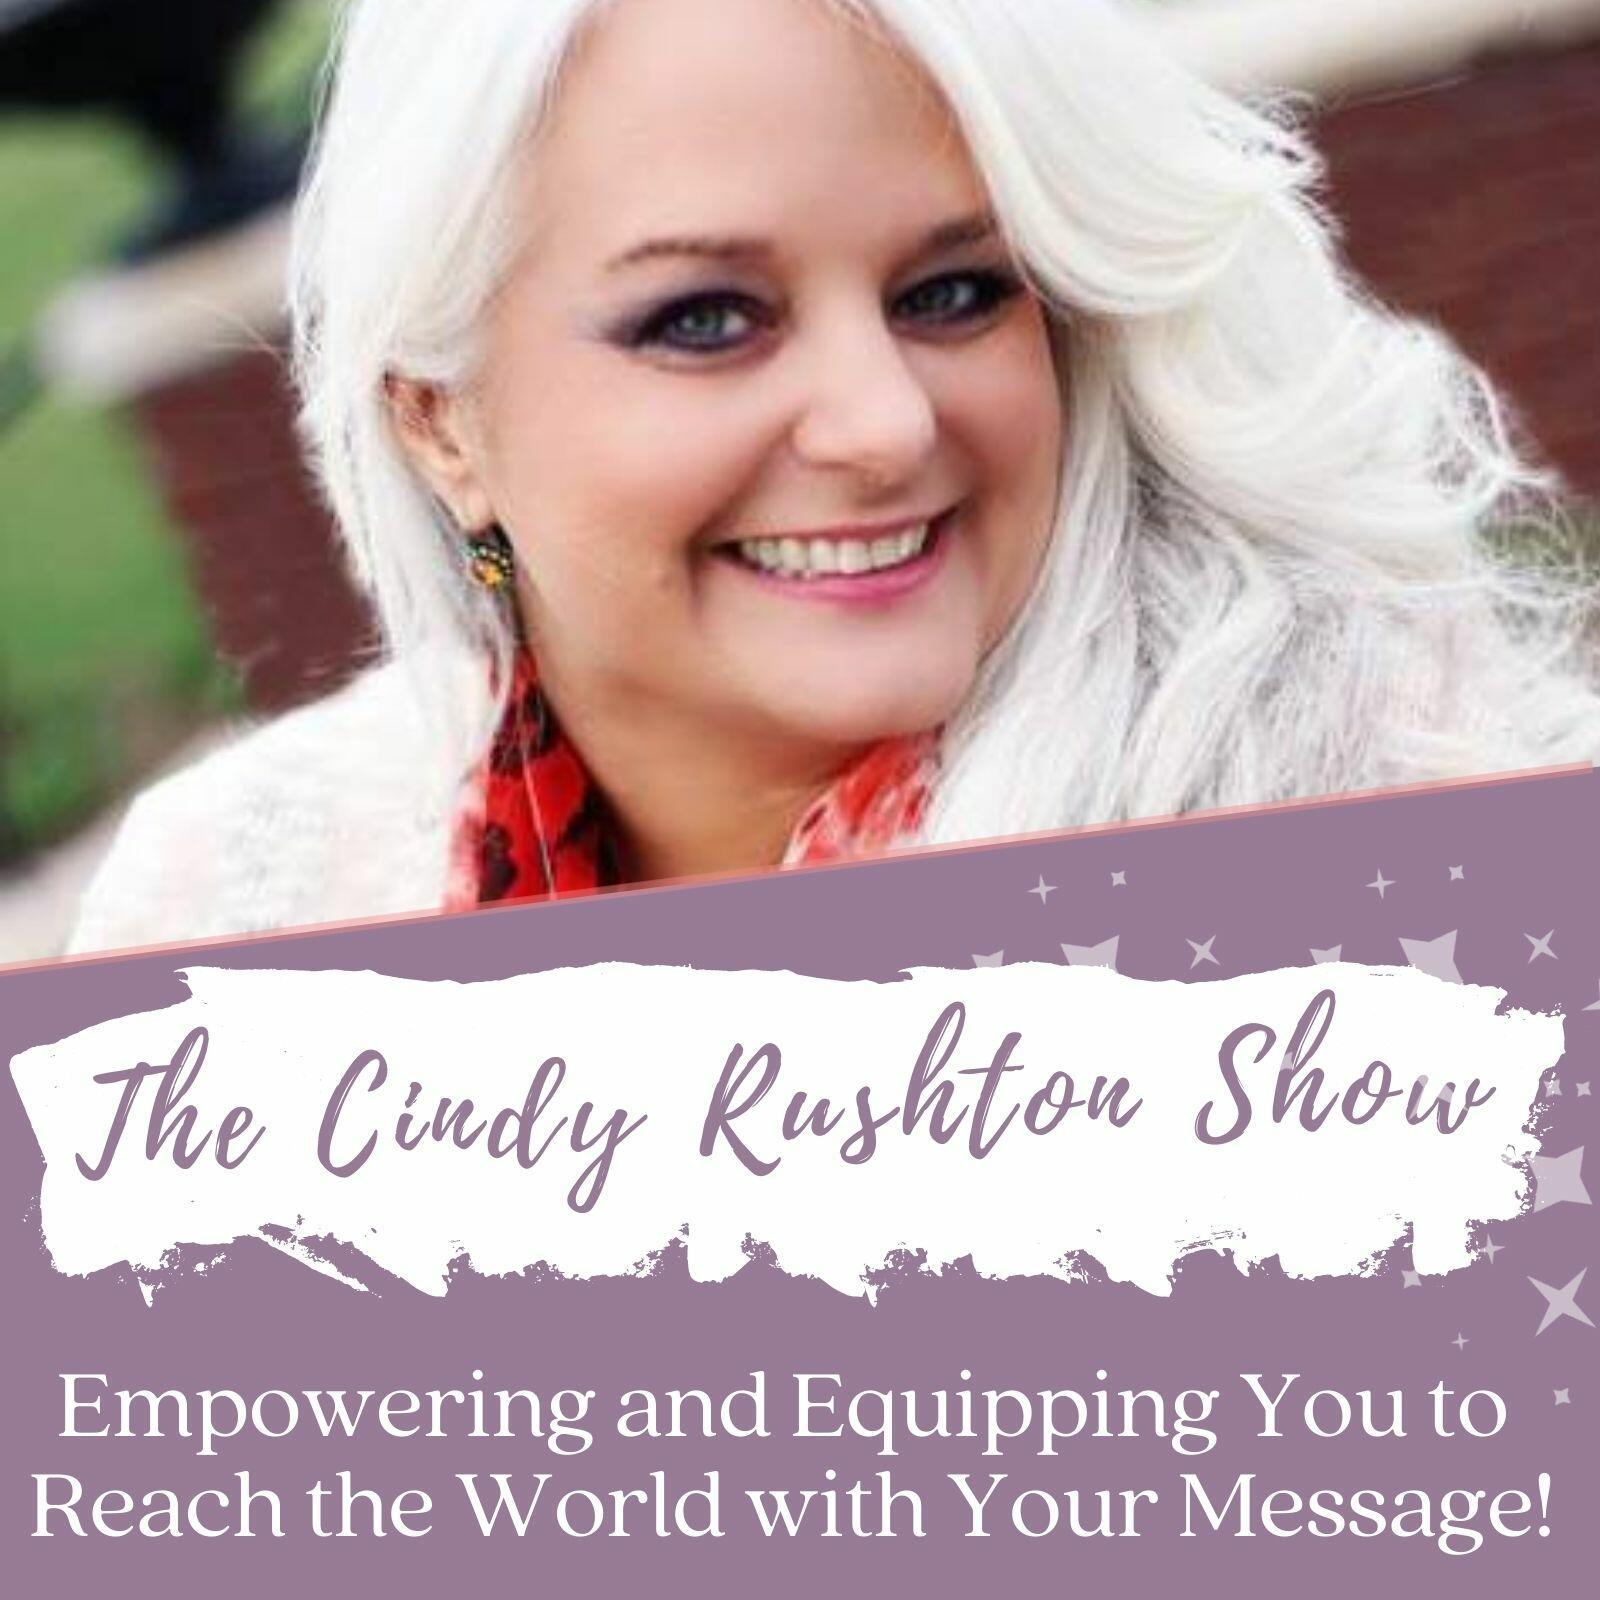 The Cindy Rushton Show